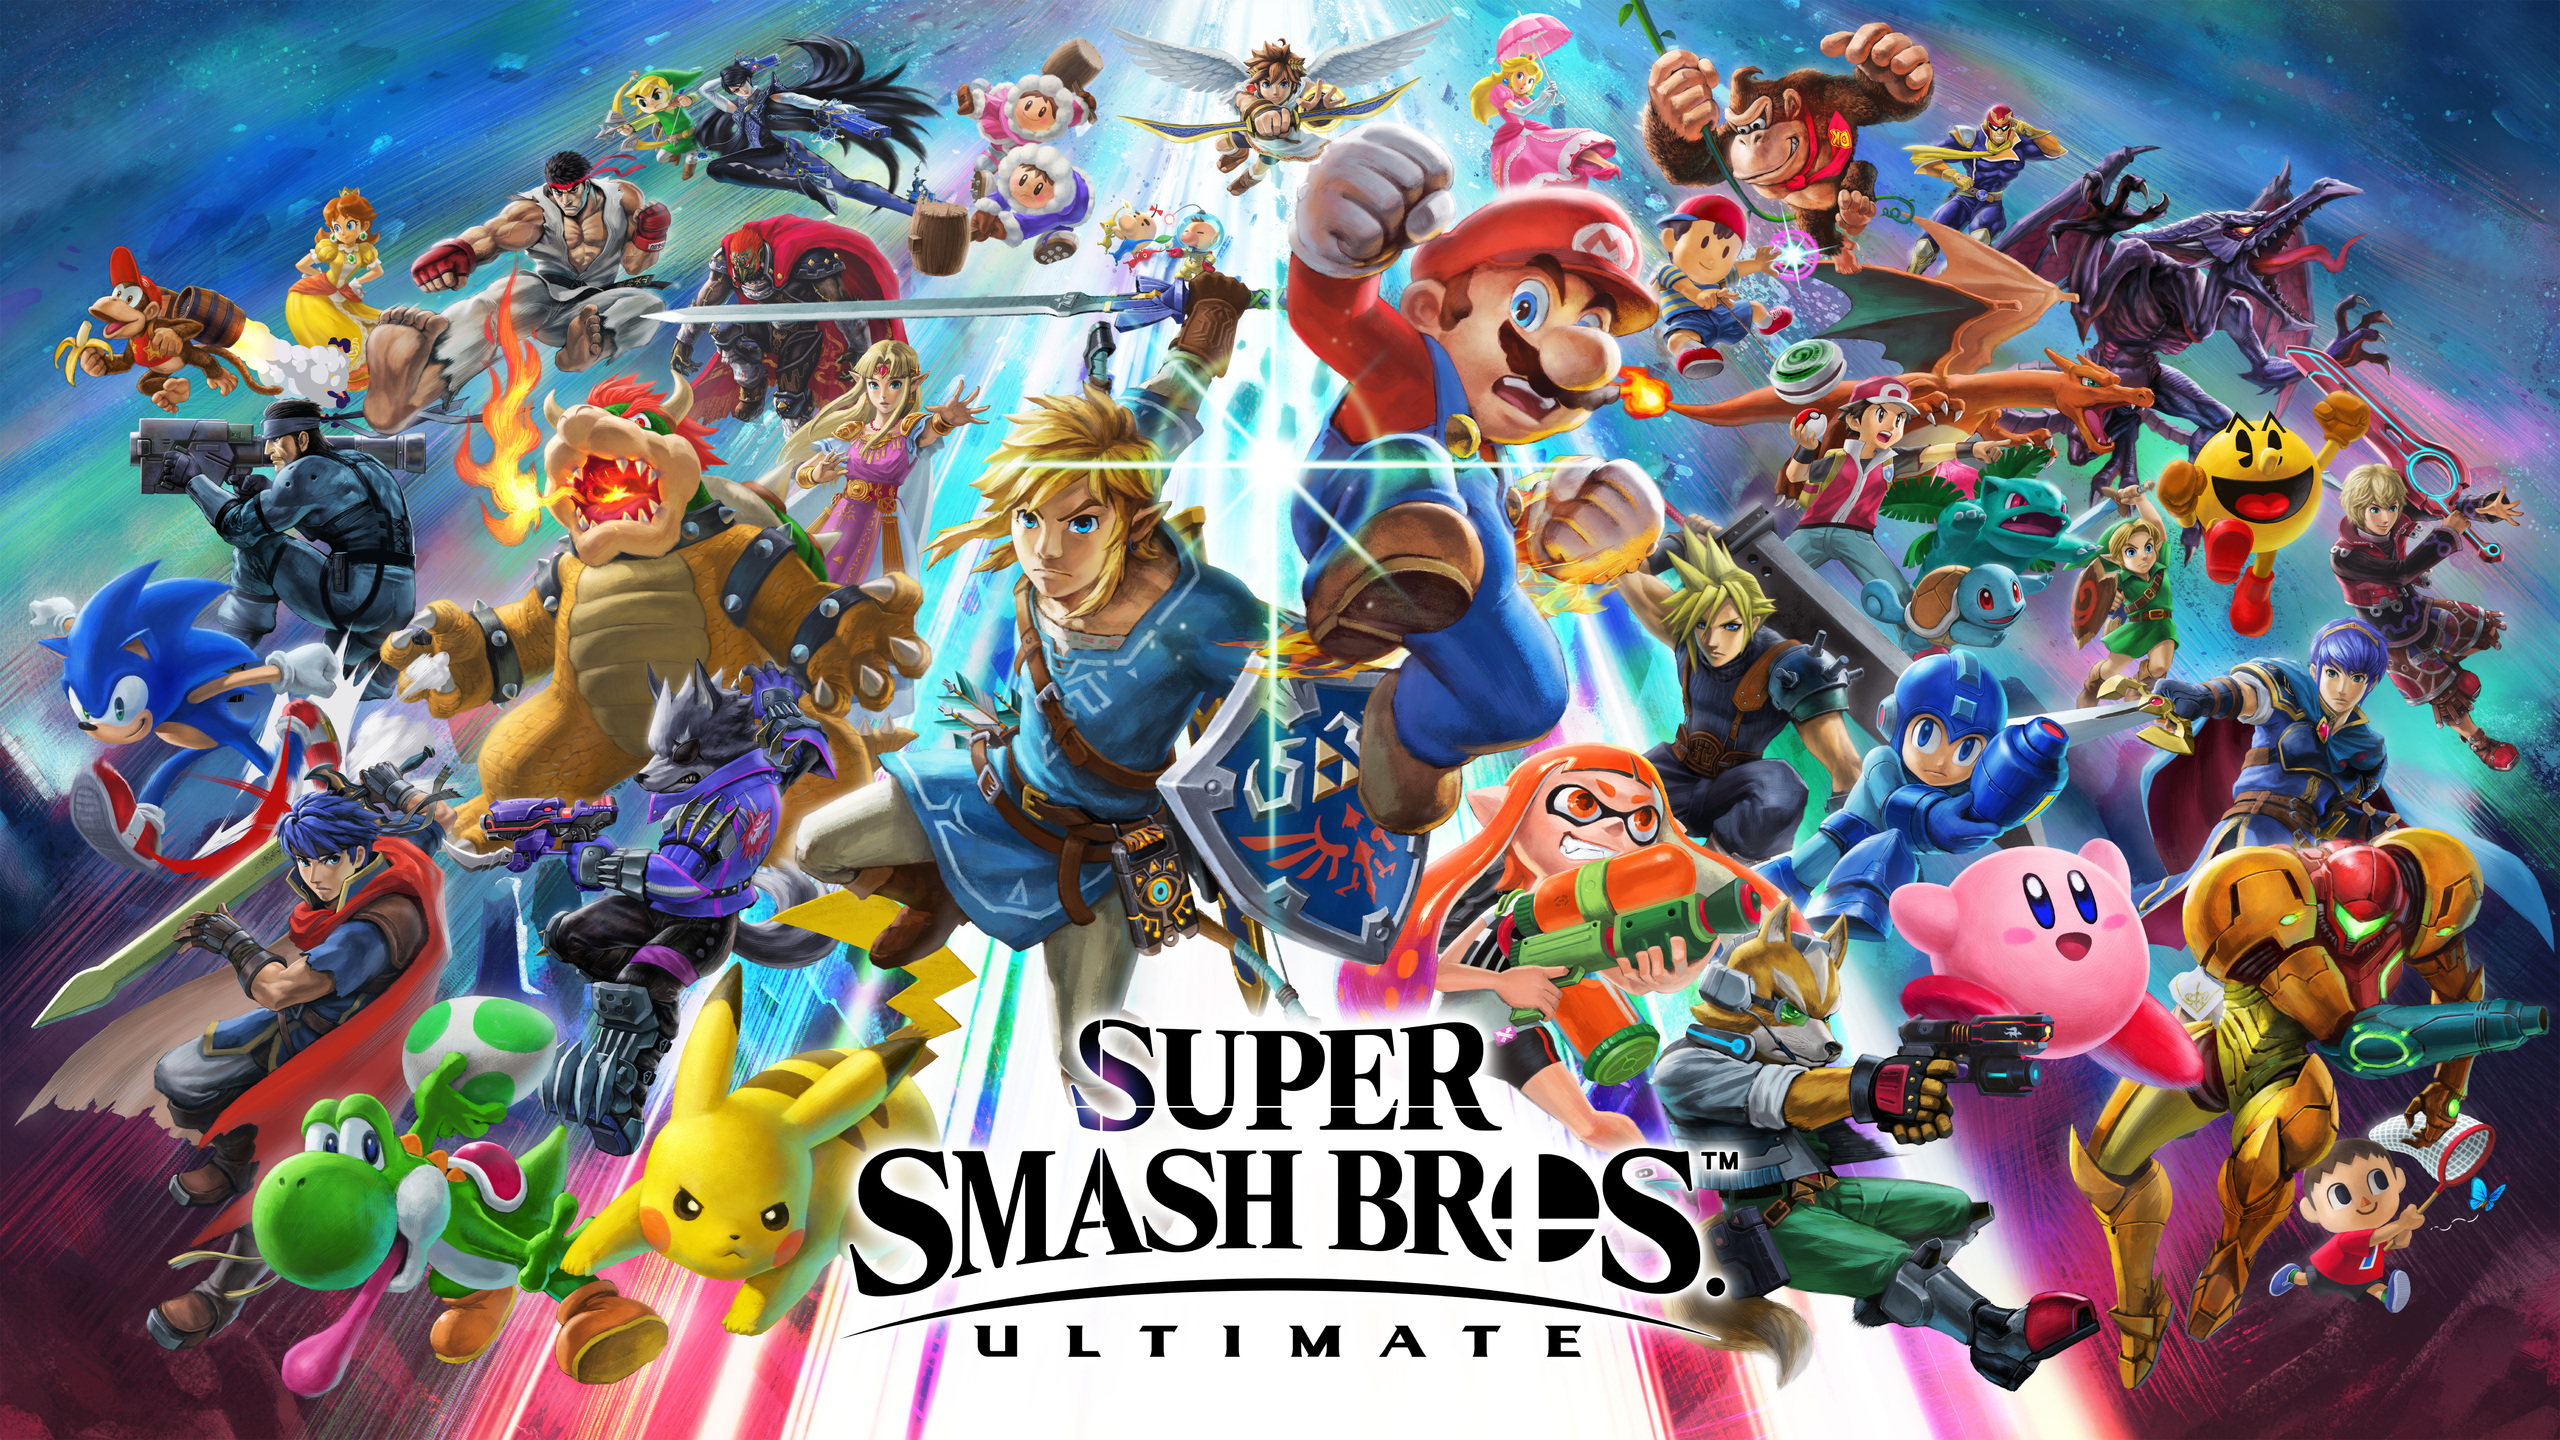 2560x1440 Super Smash Bros Ultimate 8k 1440P Resolution HD ...